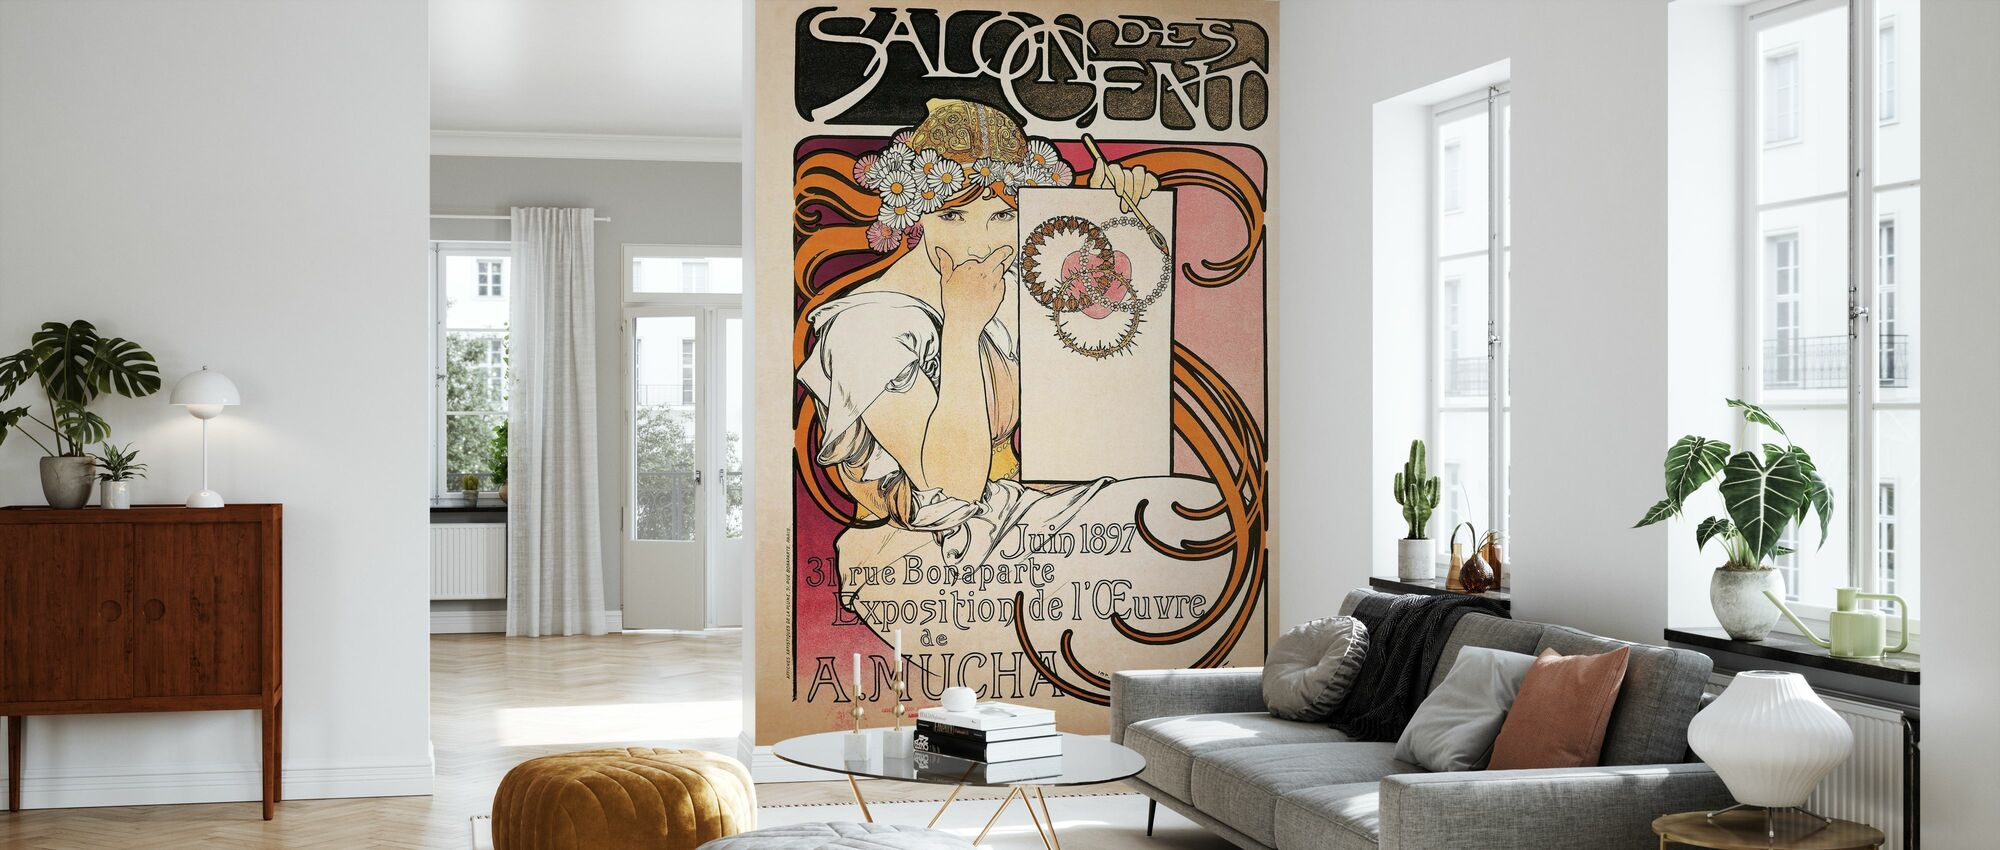 Alphonse Mucha -Salon des Cent 1897 - Wallpaper - Living Room